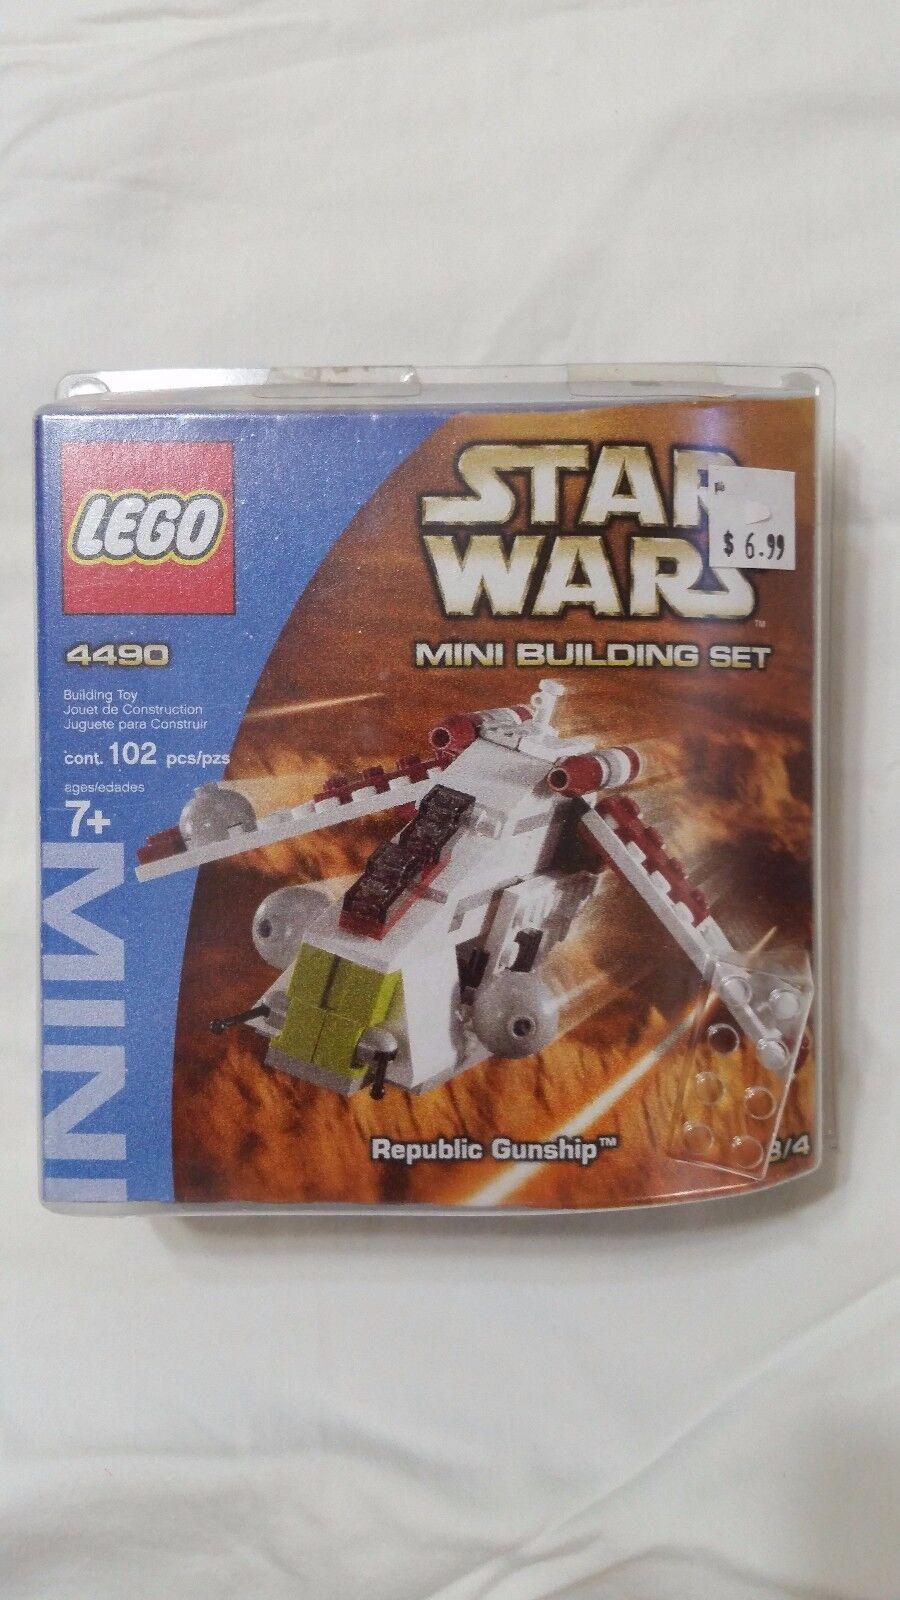 LEGO Star Wars Mini Building Set 4490 - Republic Gunship Christmas is coming